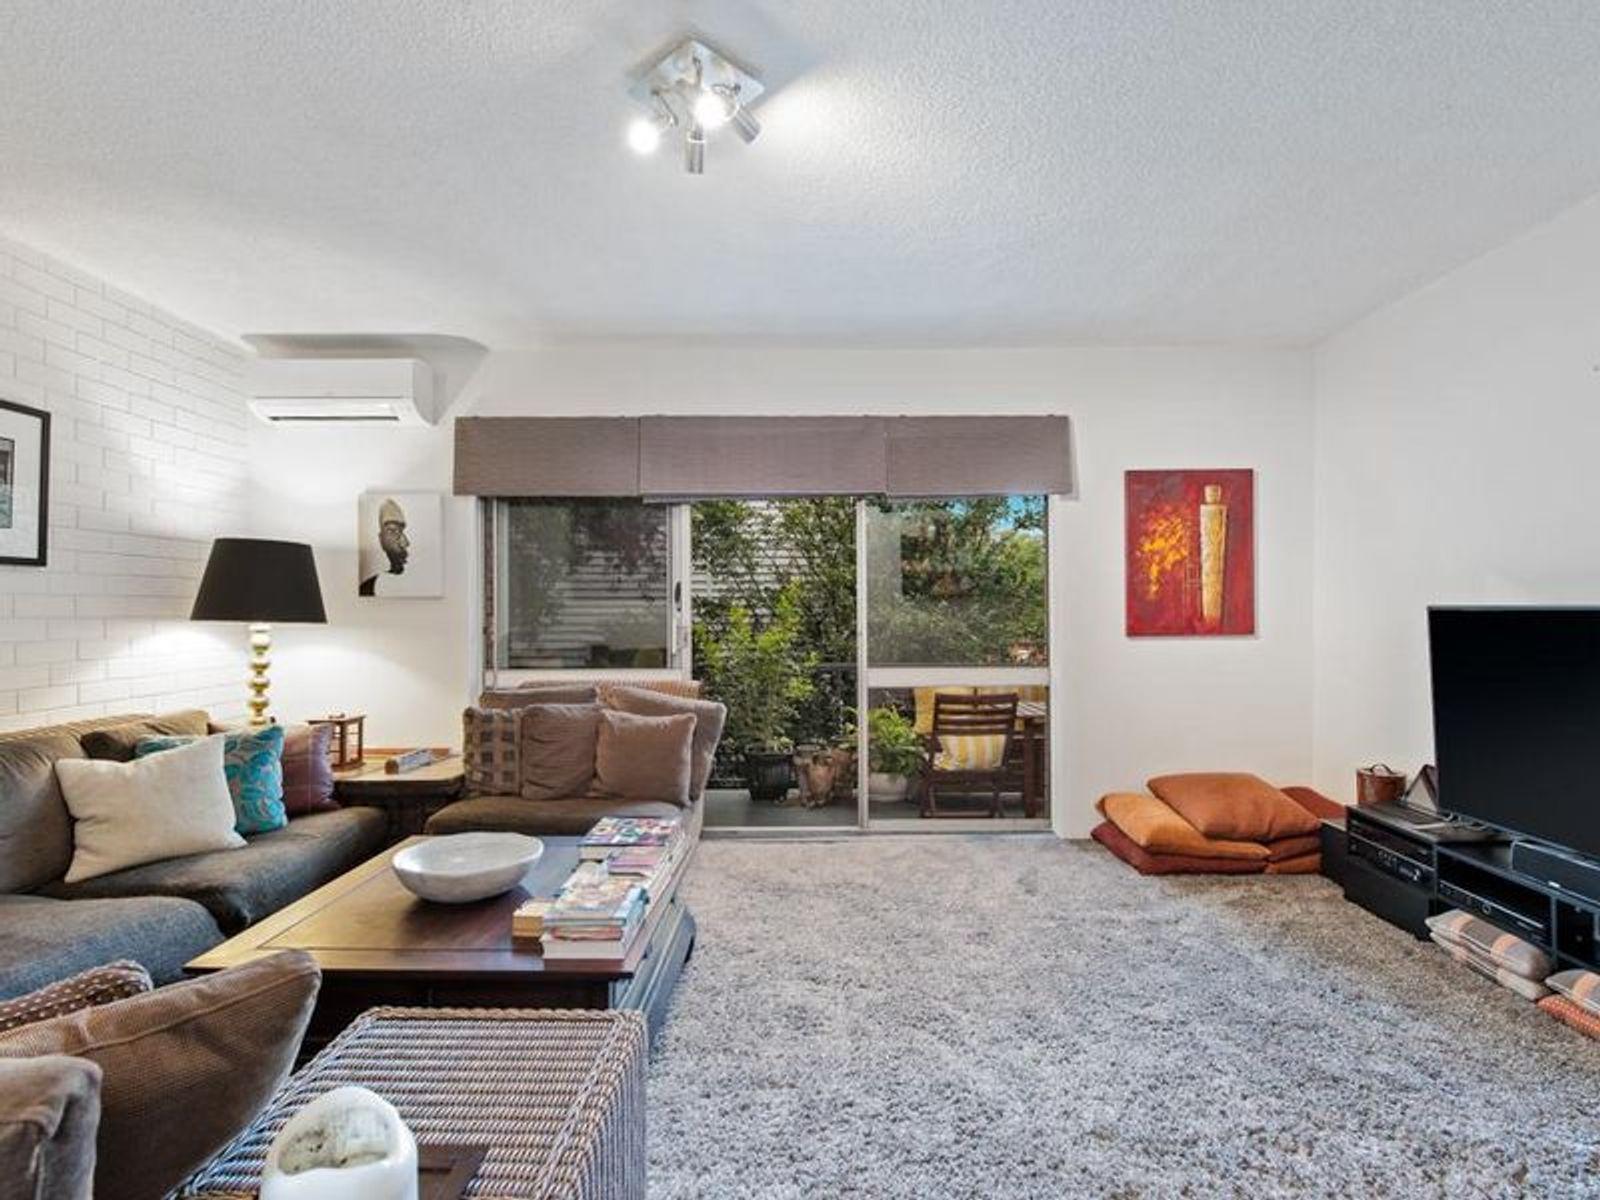 2/409 Hawthorne Road, Bulimba, QLD 4171